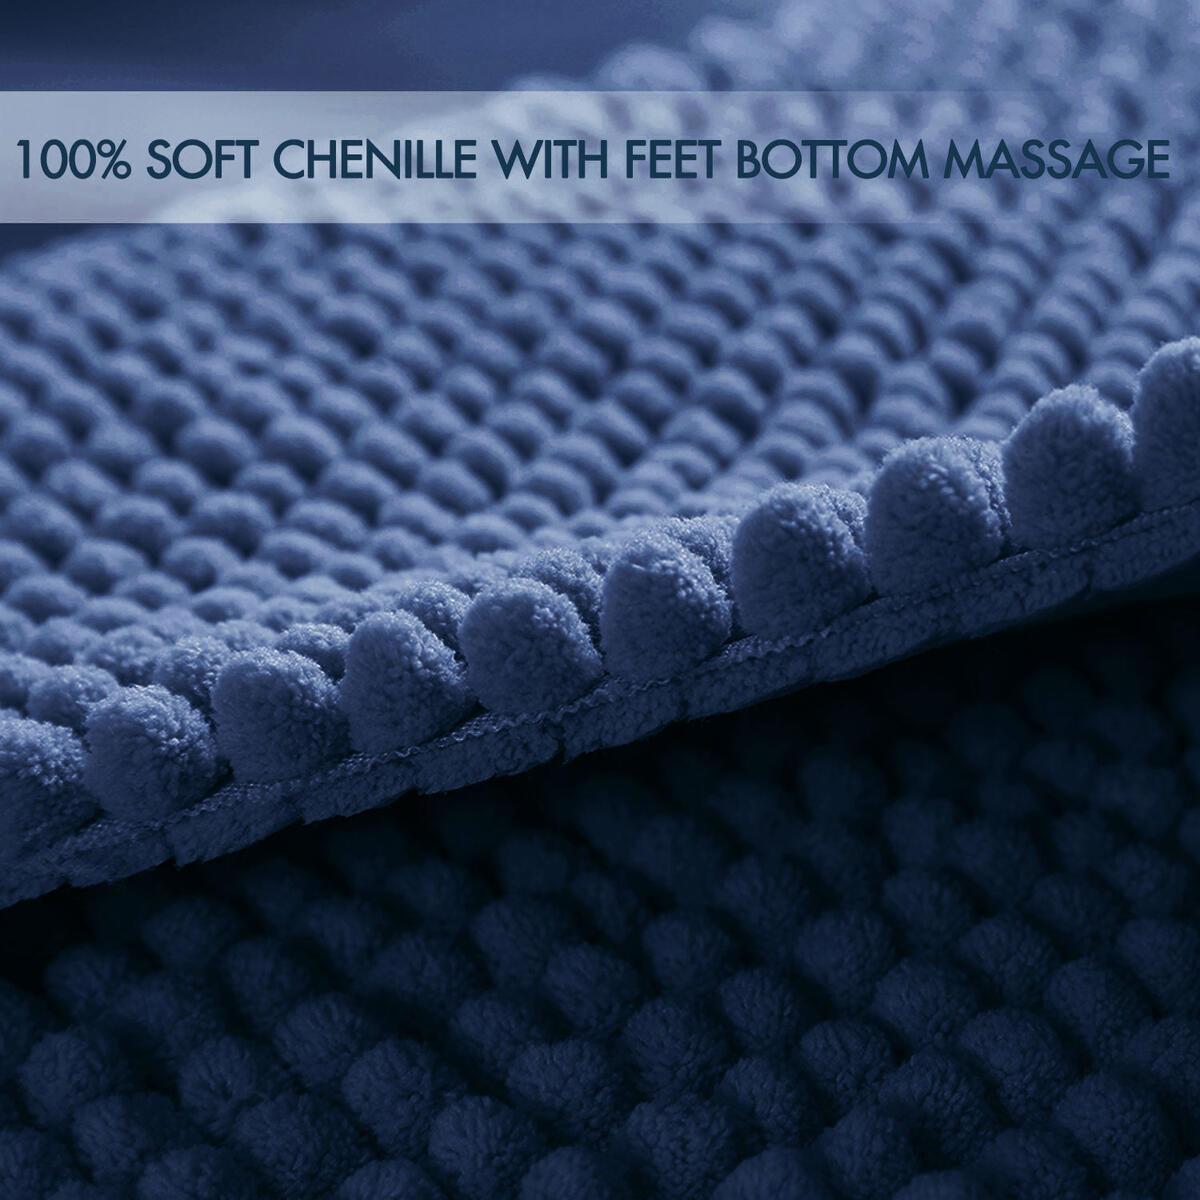 JTdiffer Premium Chenille Bath Mat, Luxury Original Bathroom Rug Carpet, Non Slip Super Absorbent Water, Extra Soft Shaggy Bath Rugs for Tub, Shower, Bath Room, Bedroom, Kitchen, Sink (21x32, Blue)